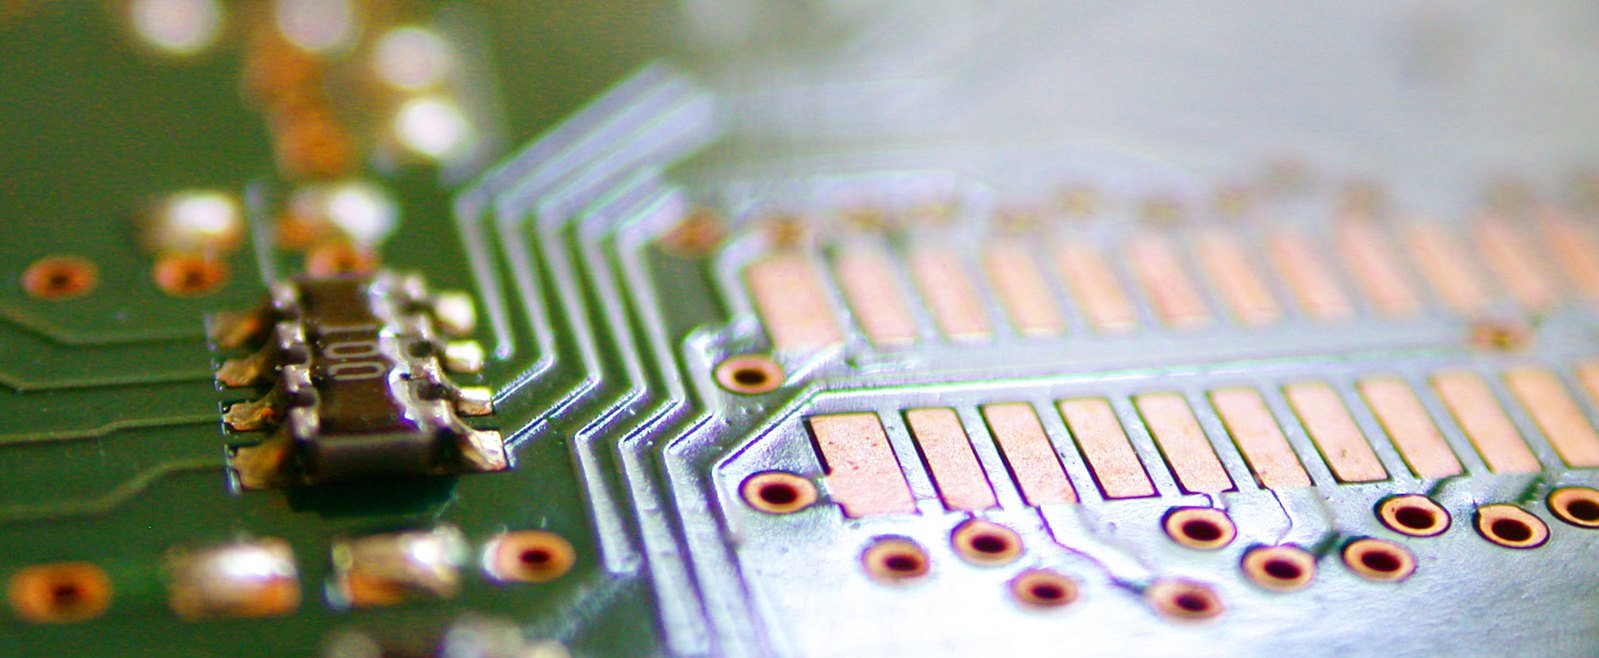 chip and microchip 3 1490677 - chip-and-microchip-3-1490677